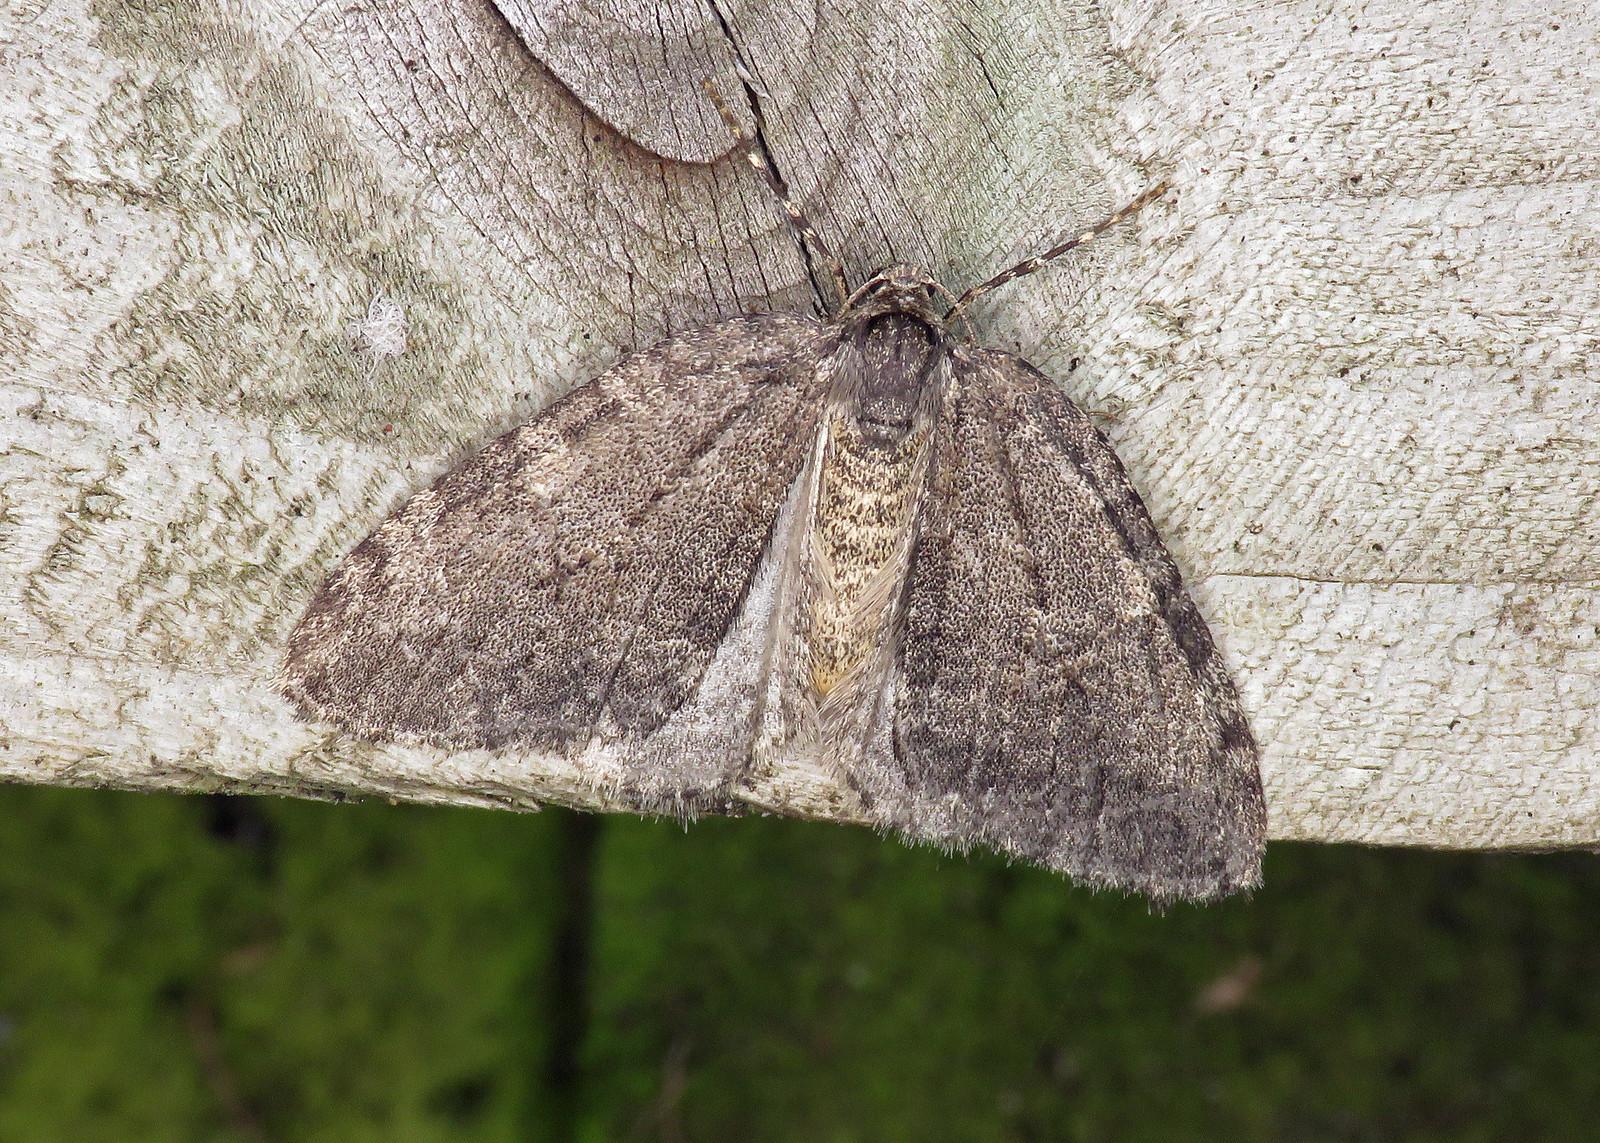 70.107x November Moth - Epirrita dilutata agg.